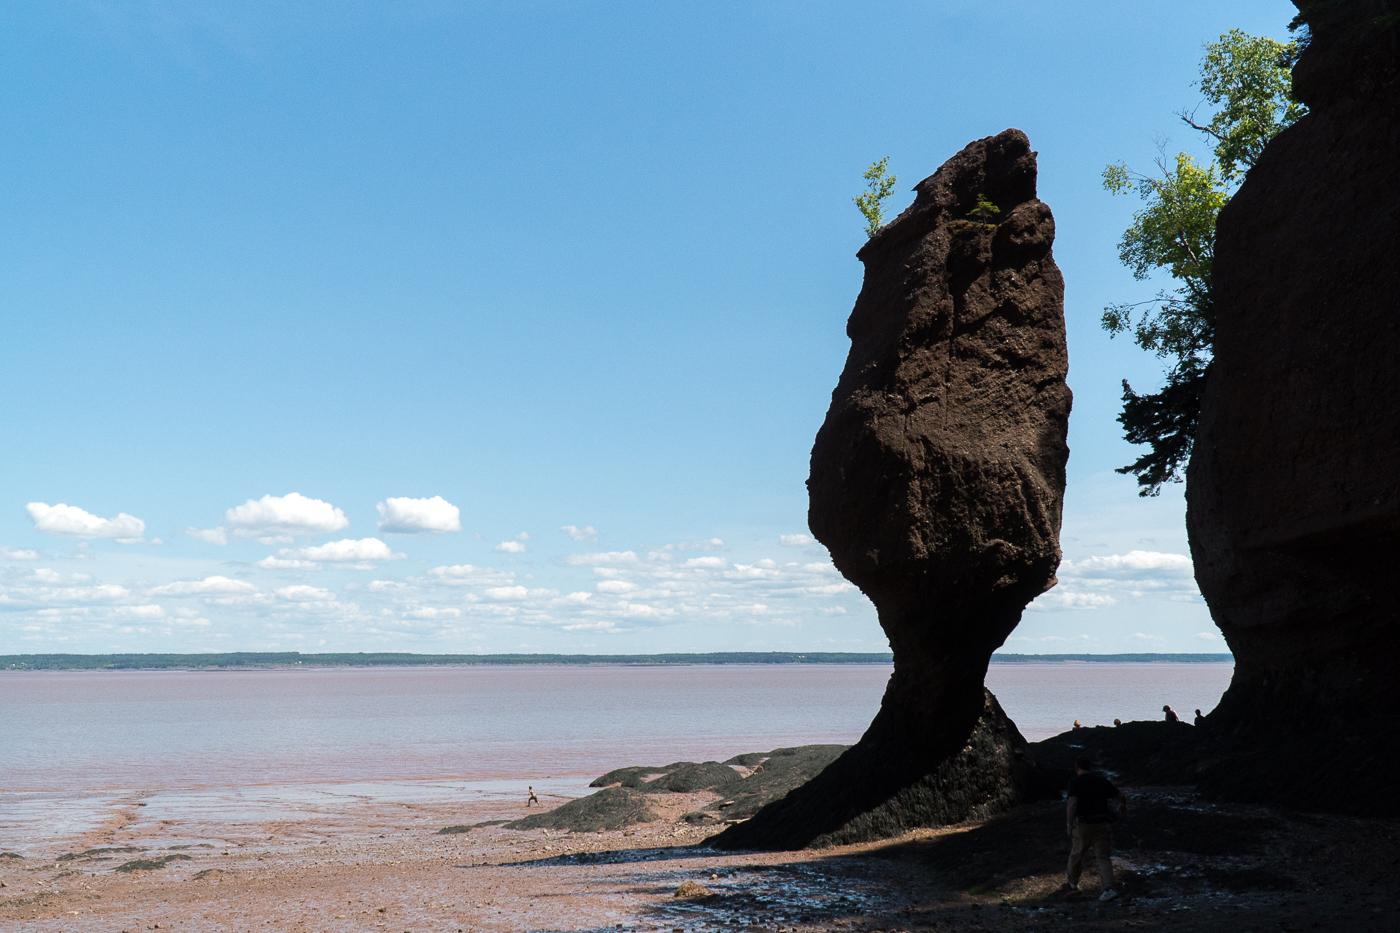 Incontournable à voir au Canada, Hopewell Rocks